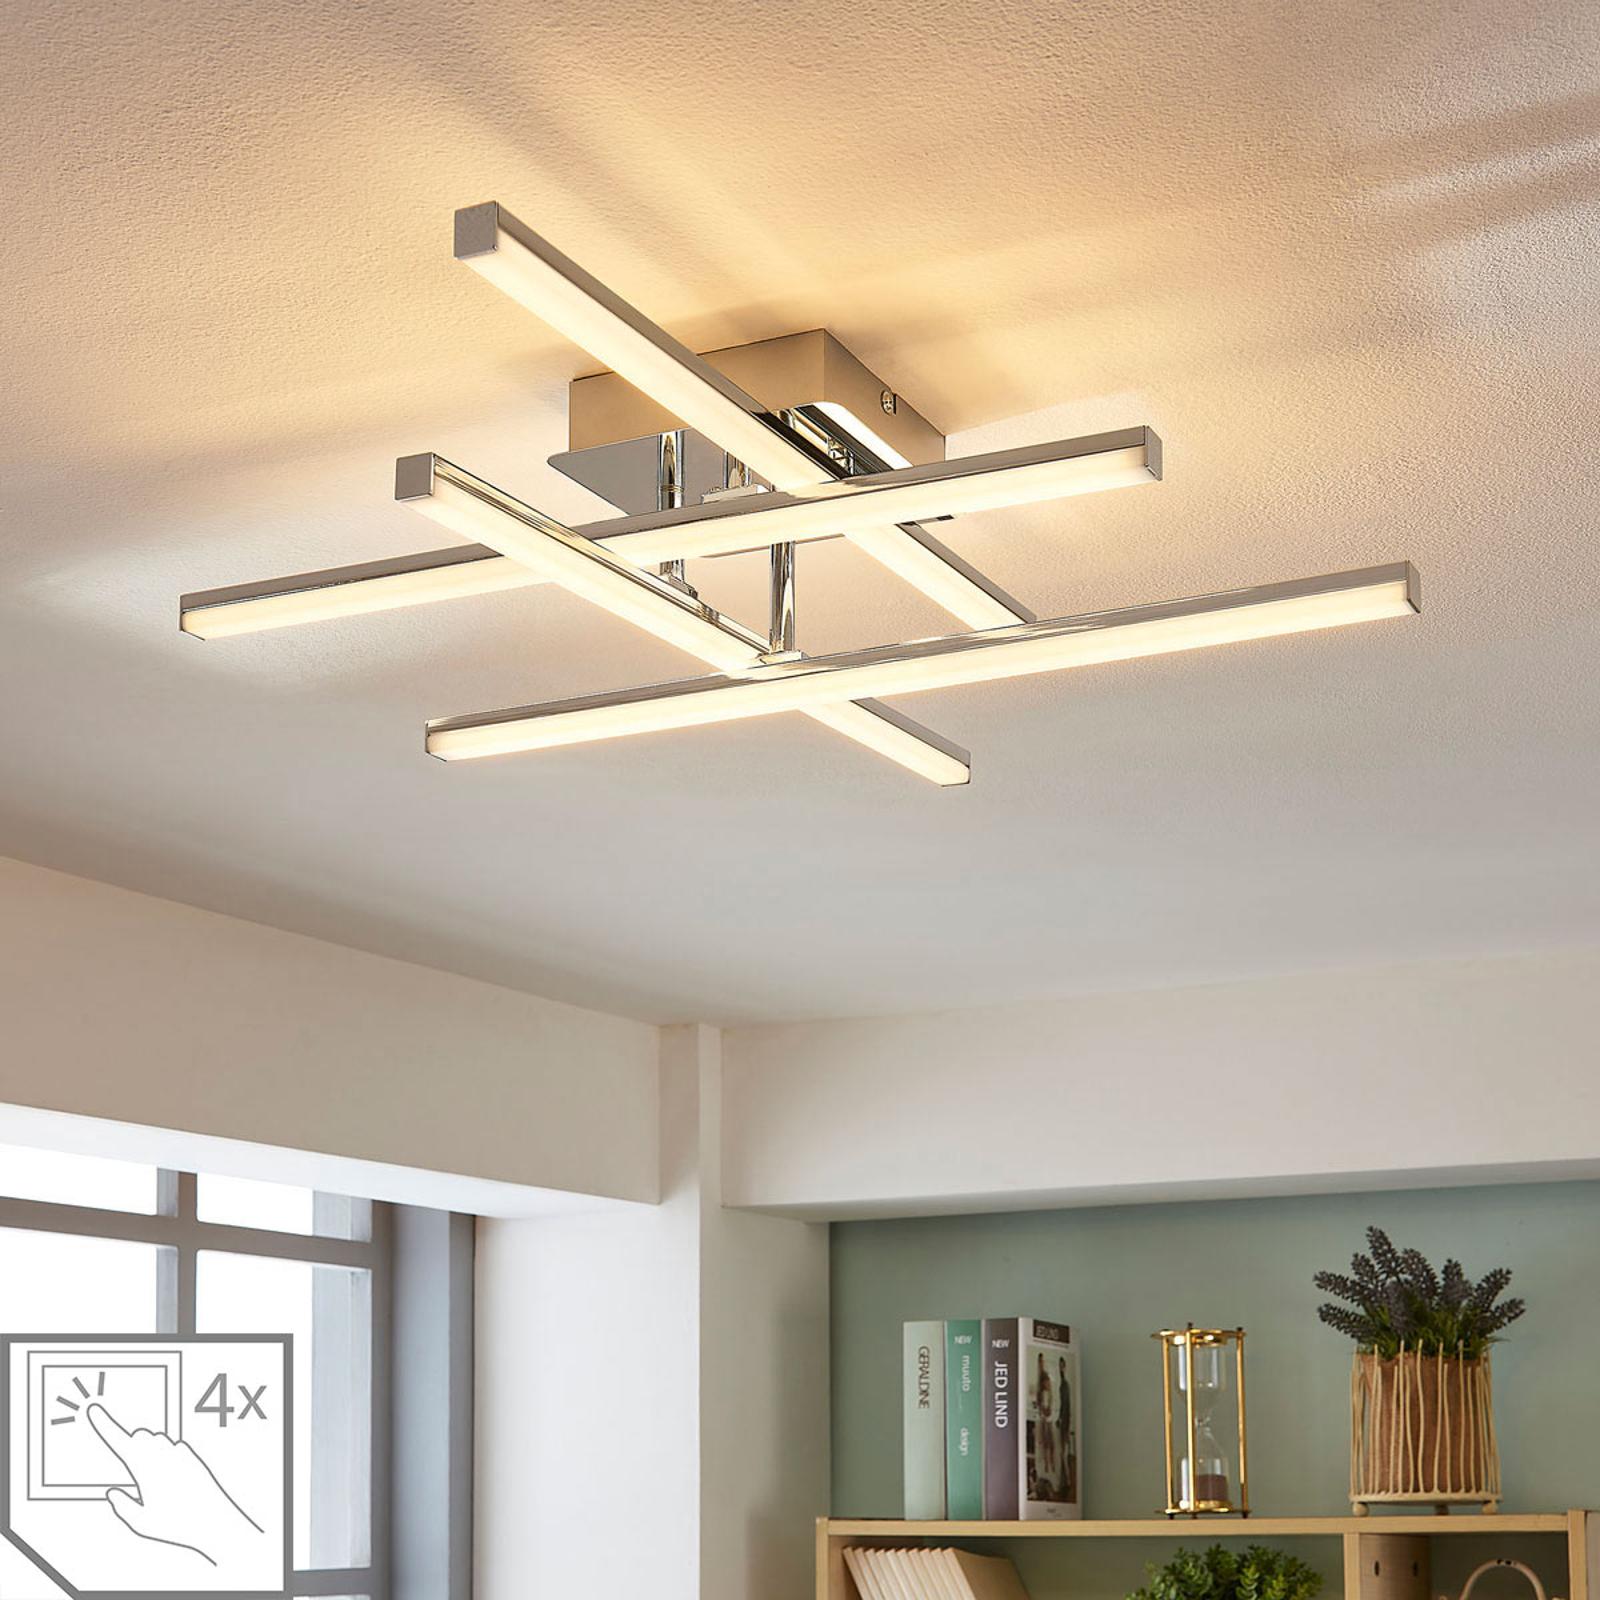 Plafón LED Korona regulable, atenuable